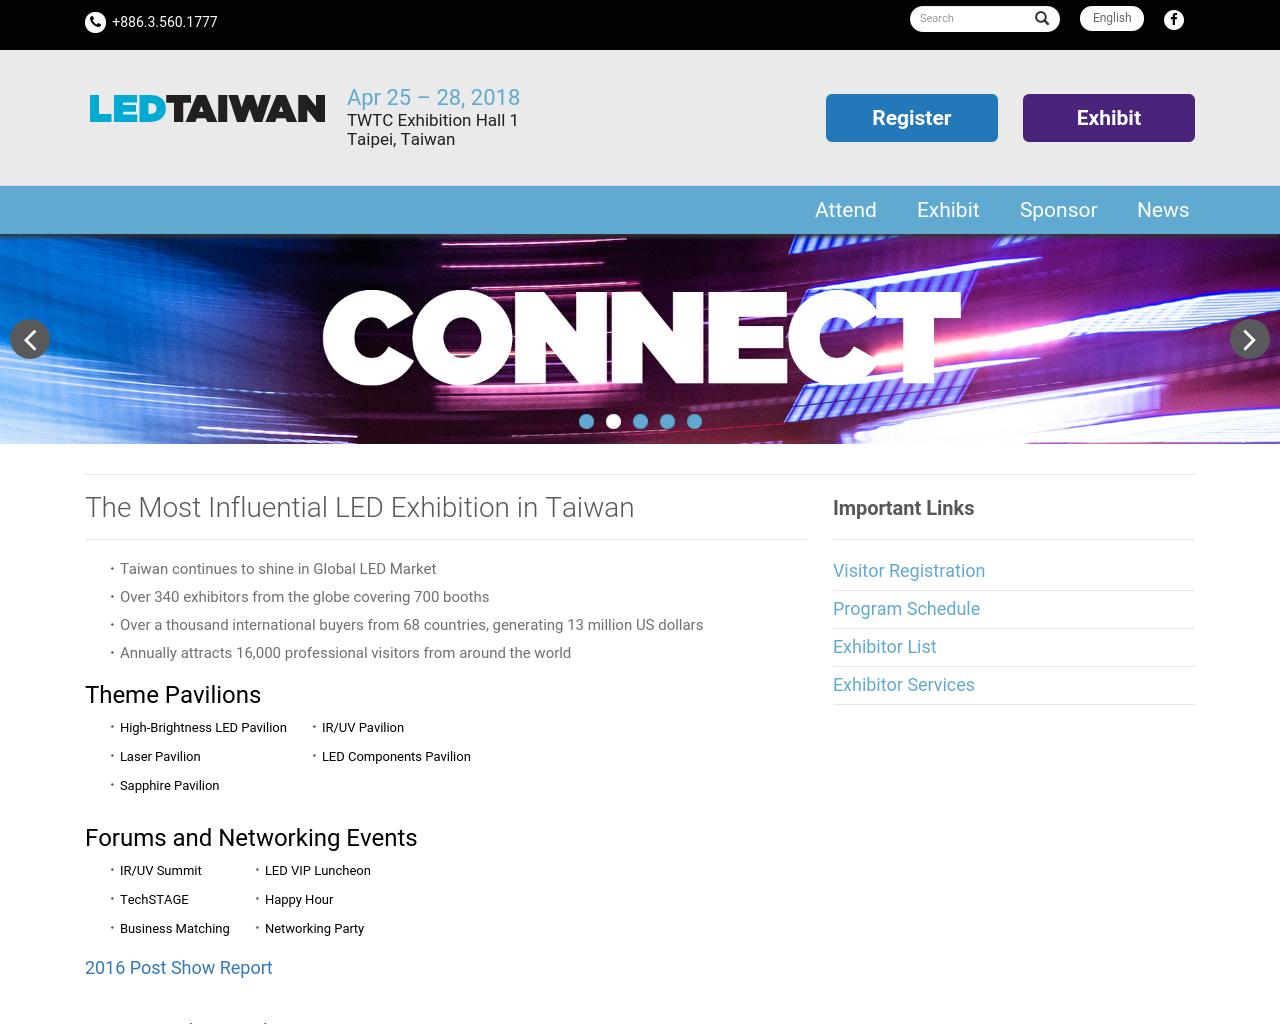 Led-Taiwan-Advertising-Reviews-Pricing